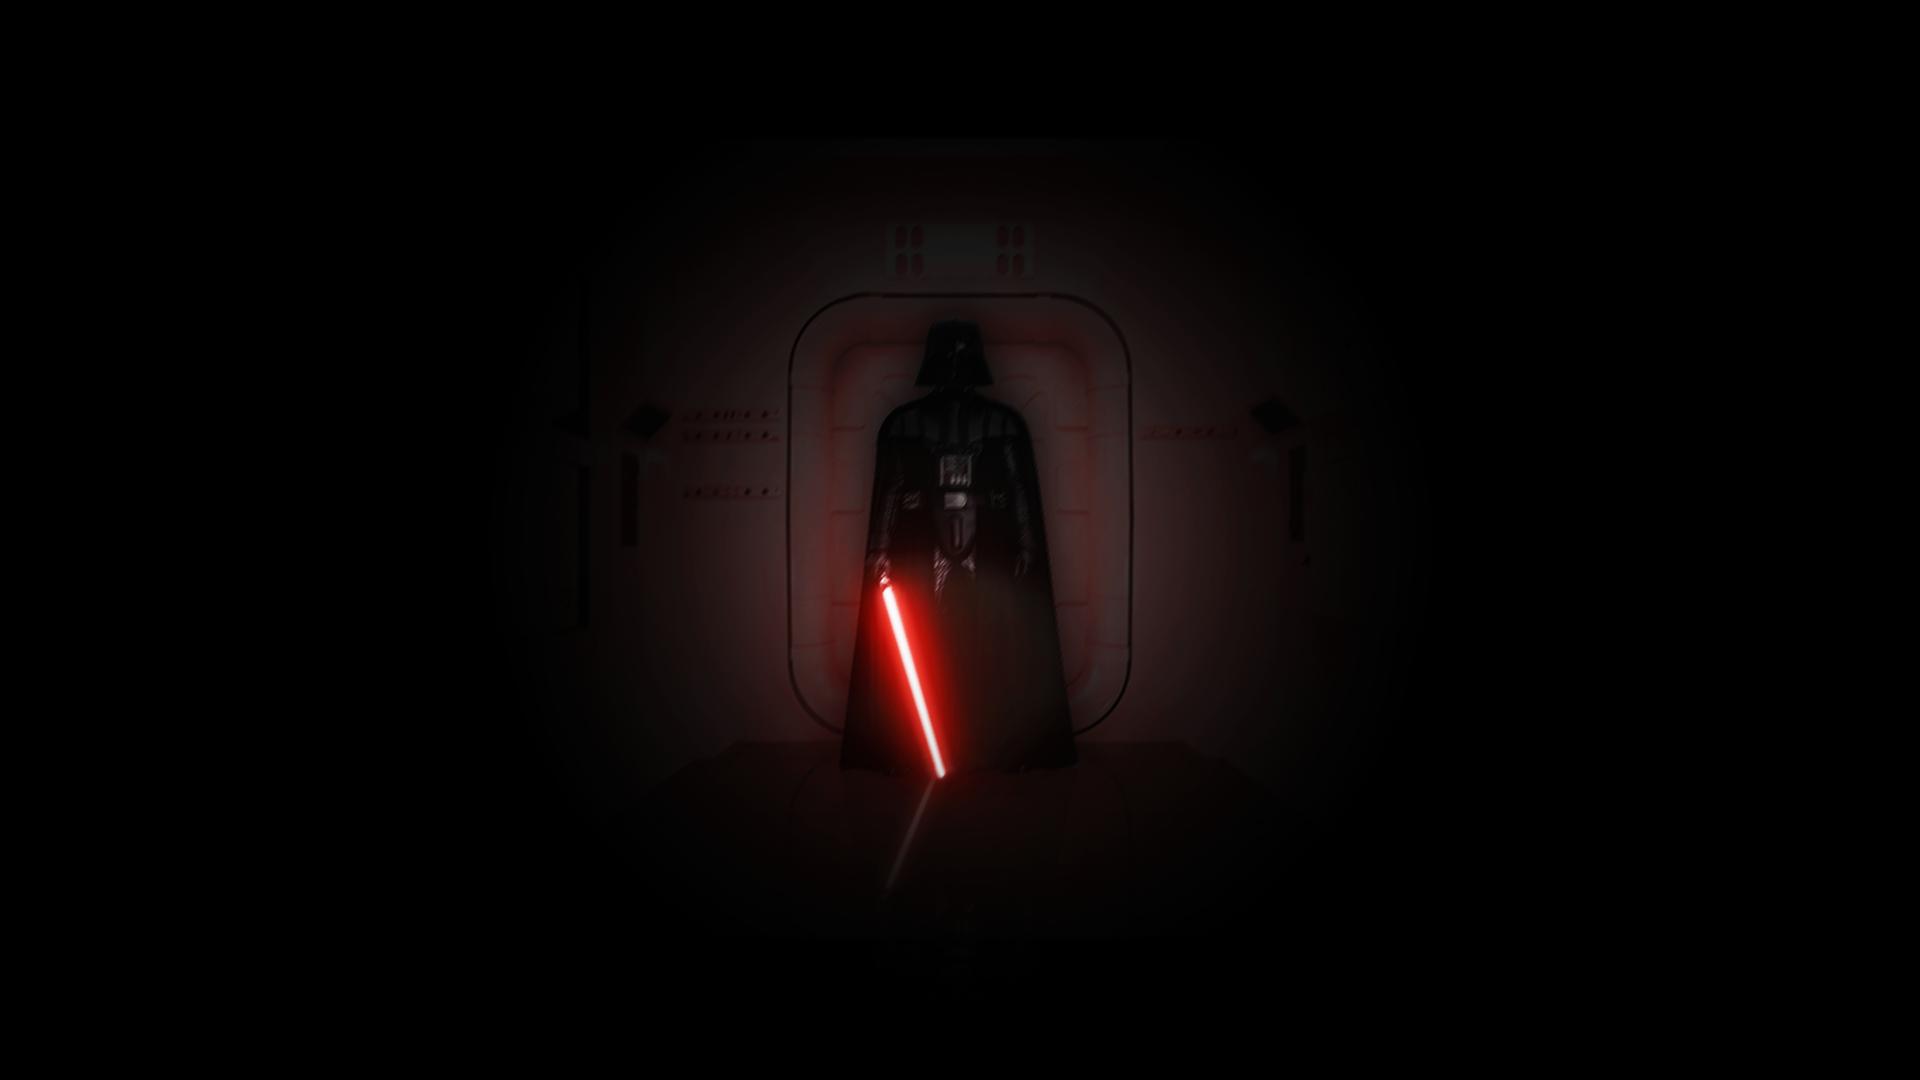 Darth Vader Sw Rogue One By Fabriciouli97 On Deviantart